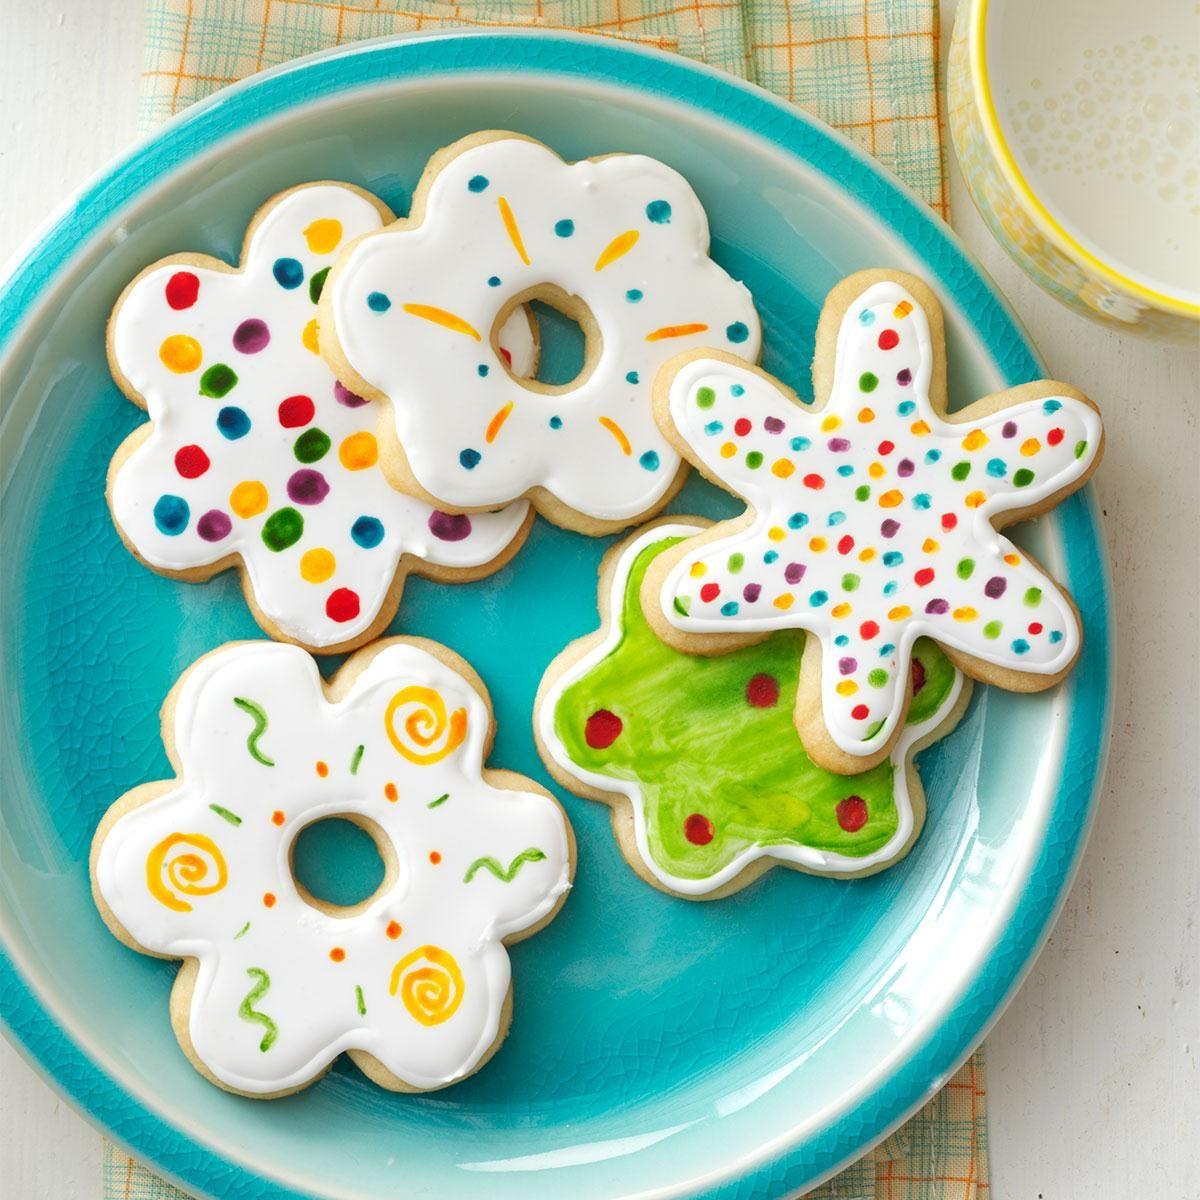 Sugar cookie recipe for 4 dozen